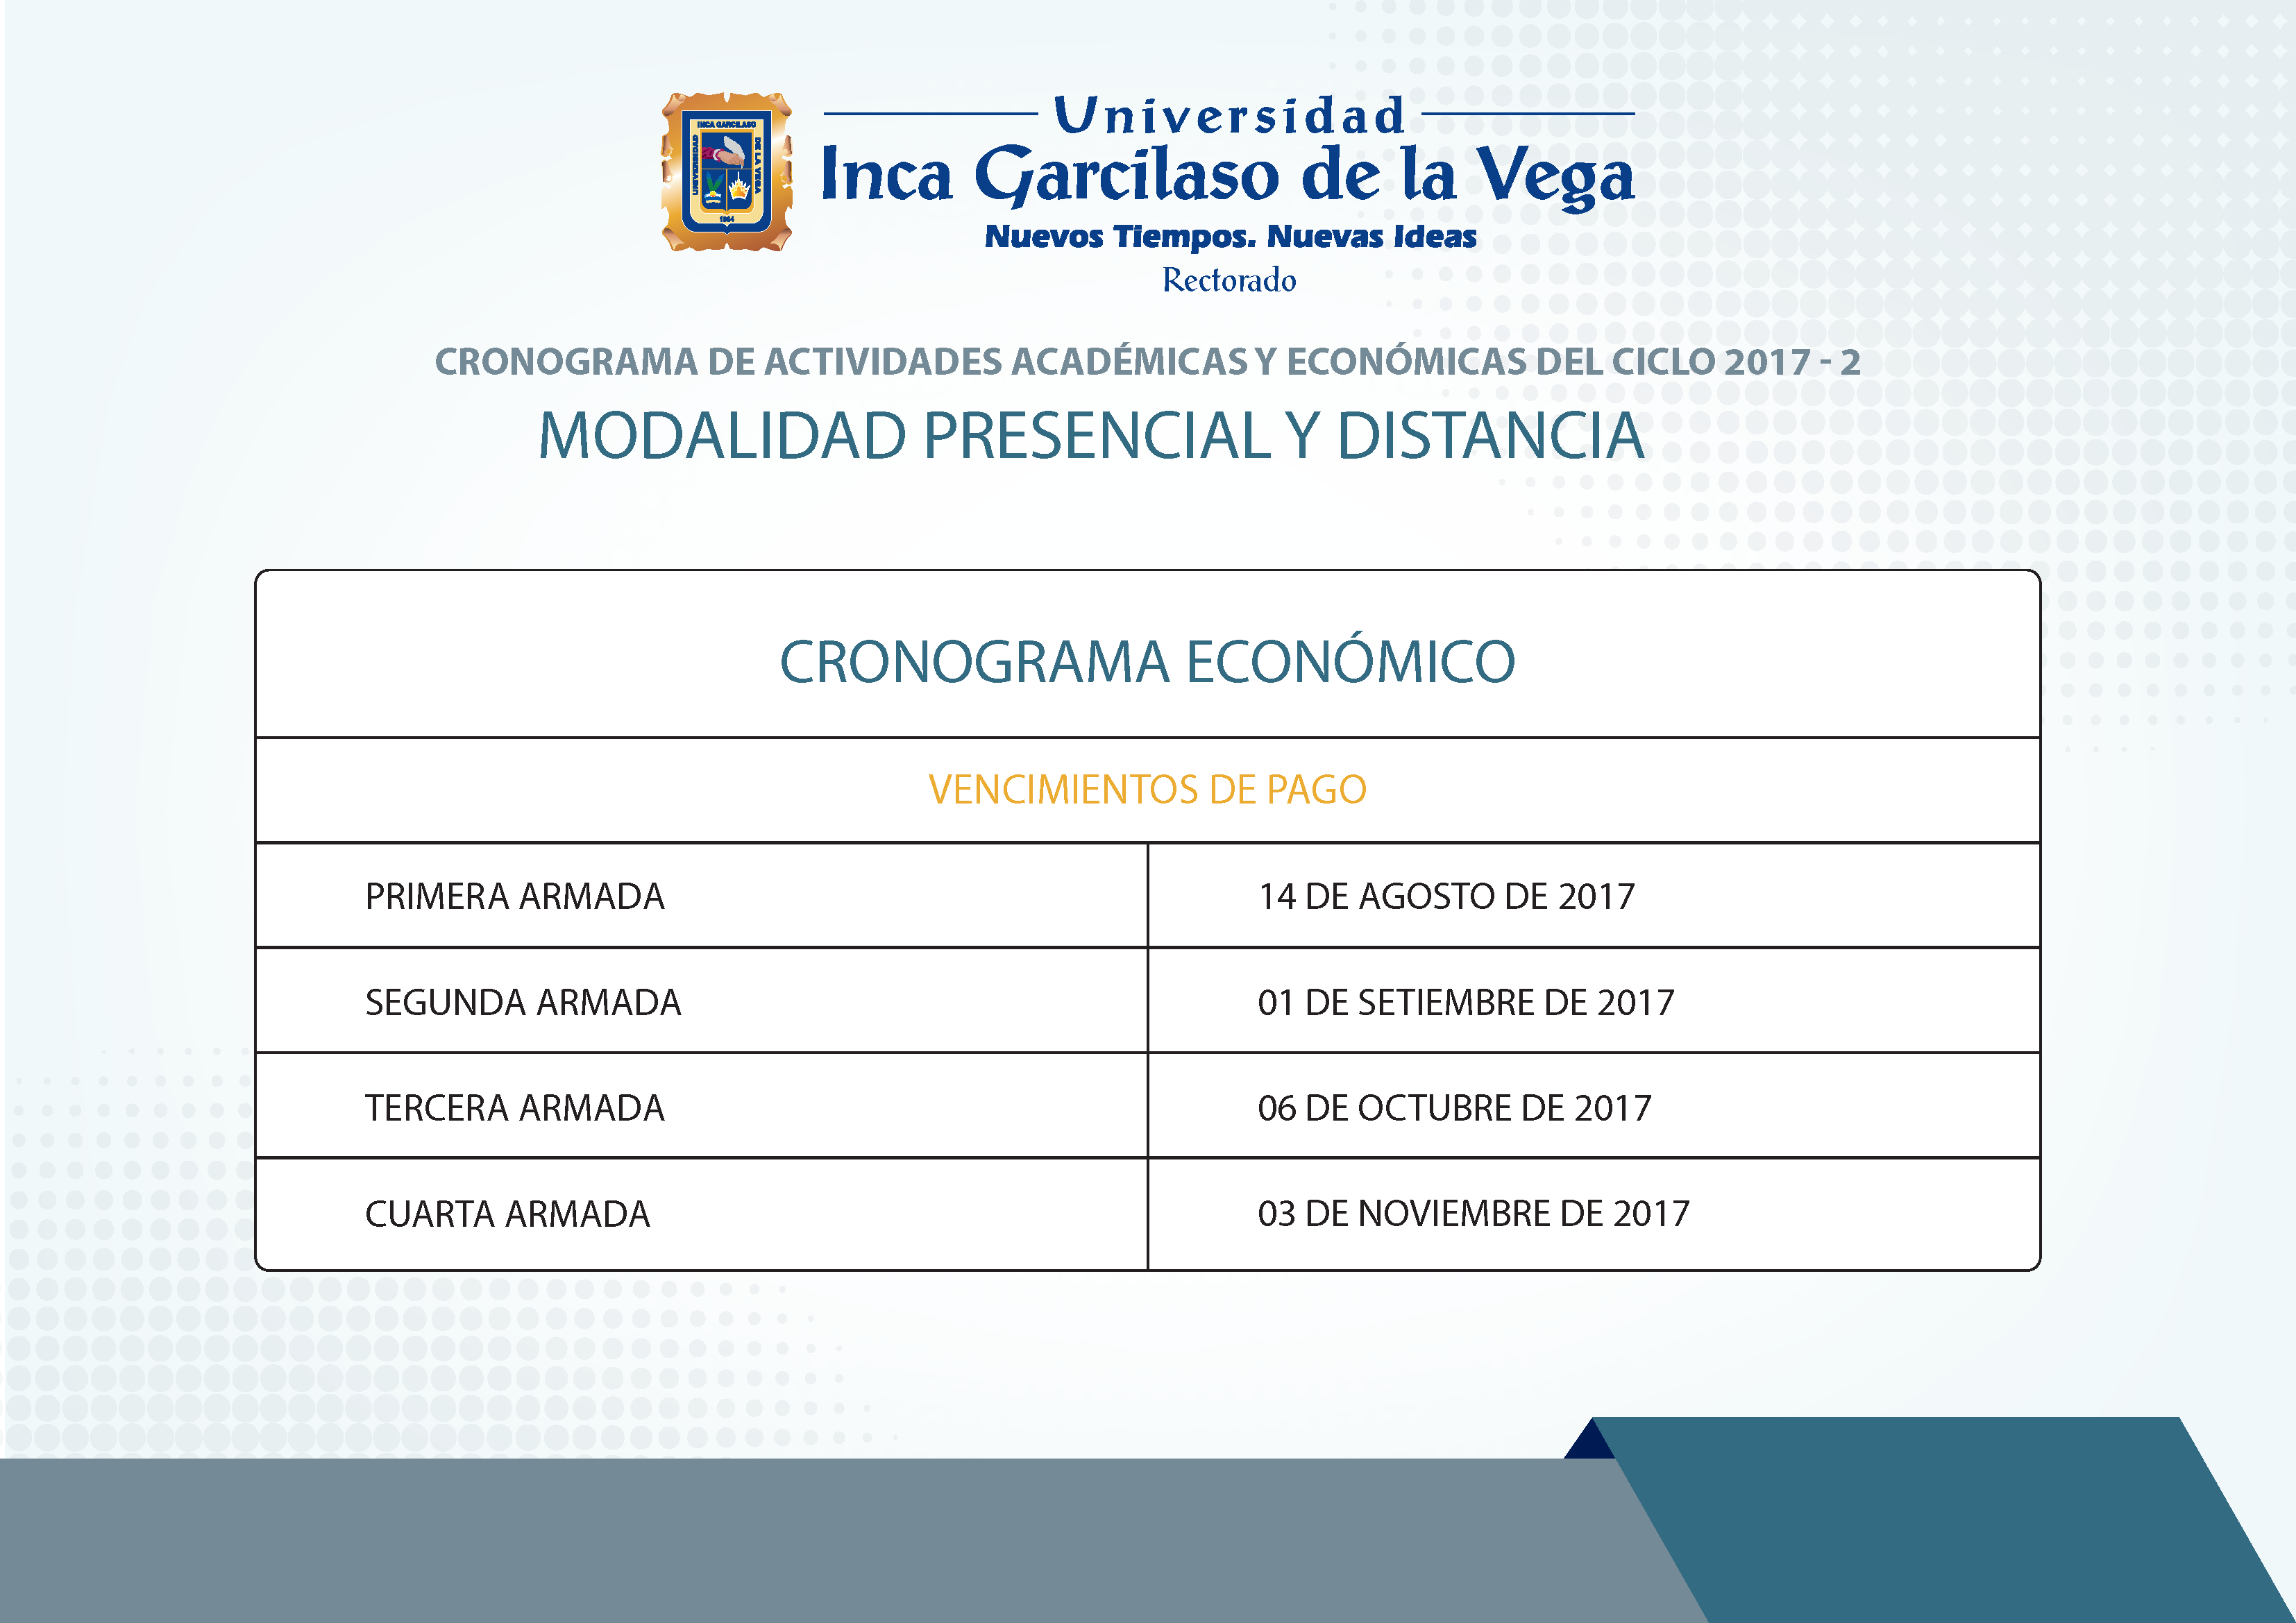 Cronograma de Actividades Académicas 2017-2